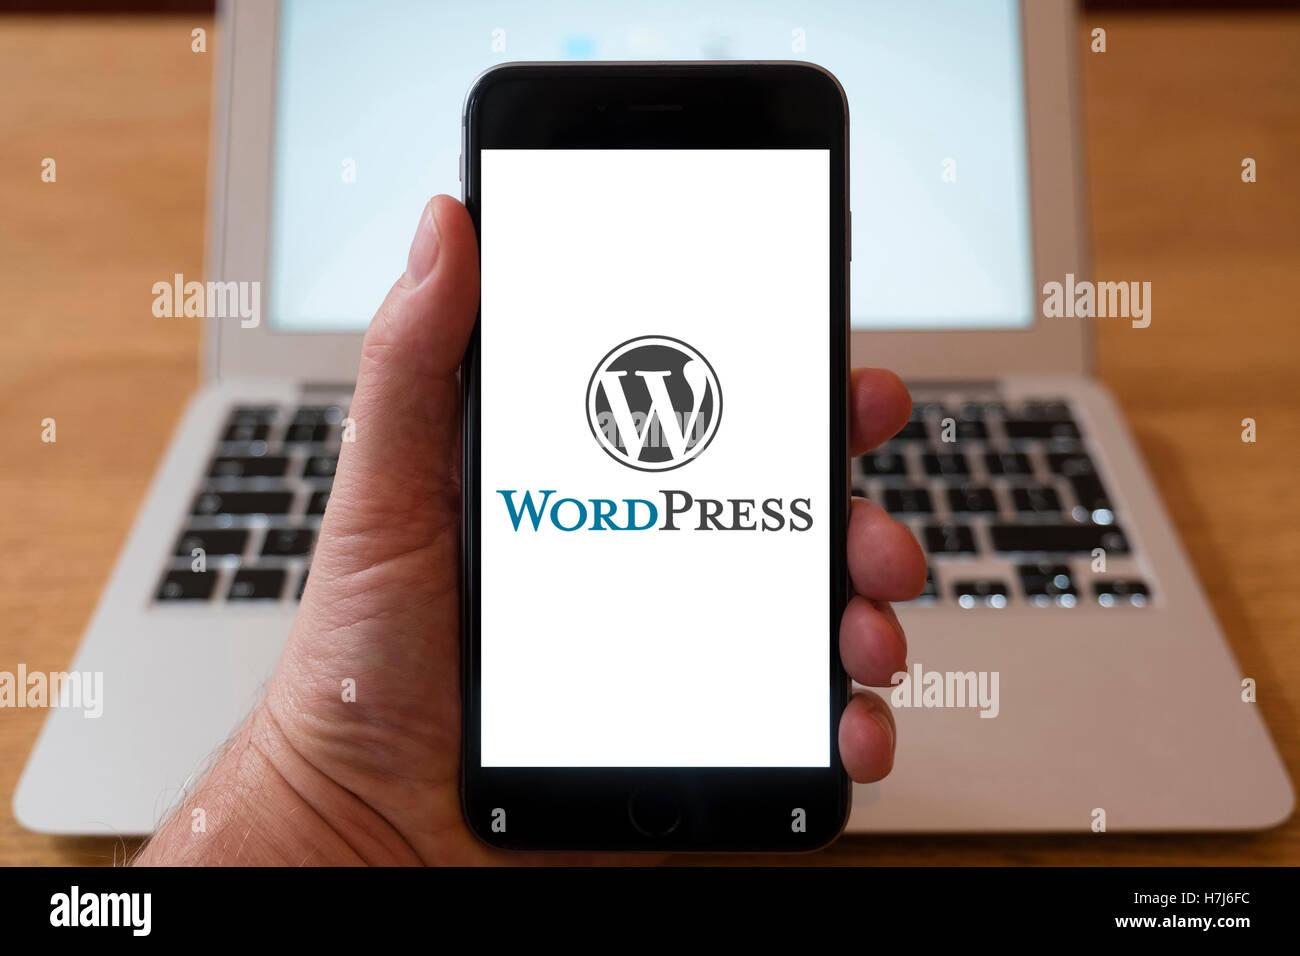 Using iPhone smart phone to display logo of Wordpress blog publishing service - Stock Image